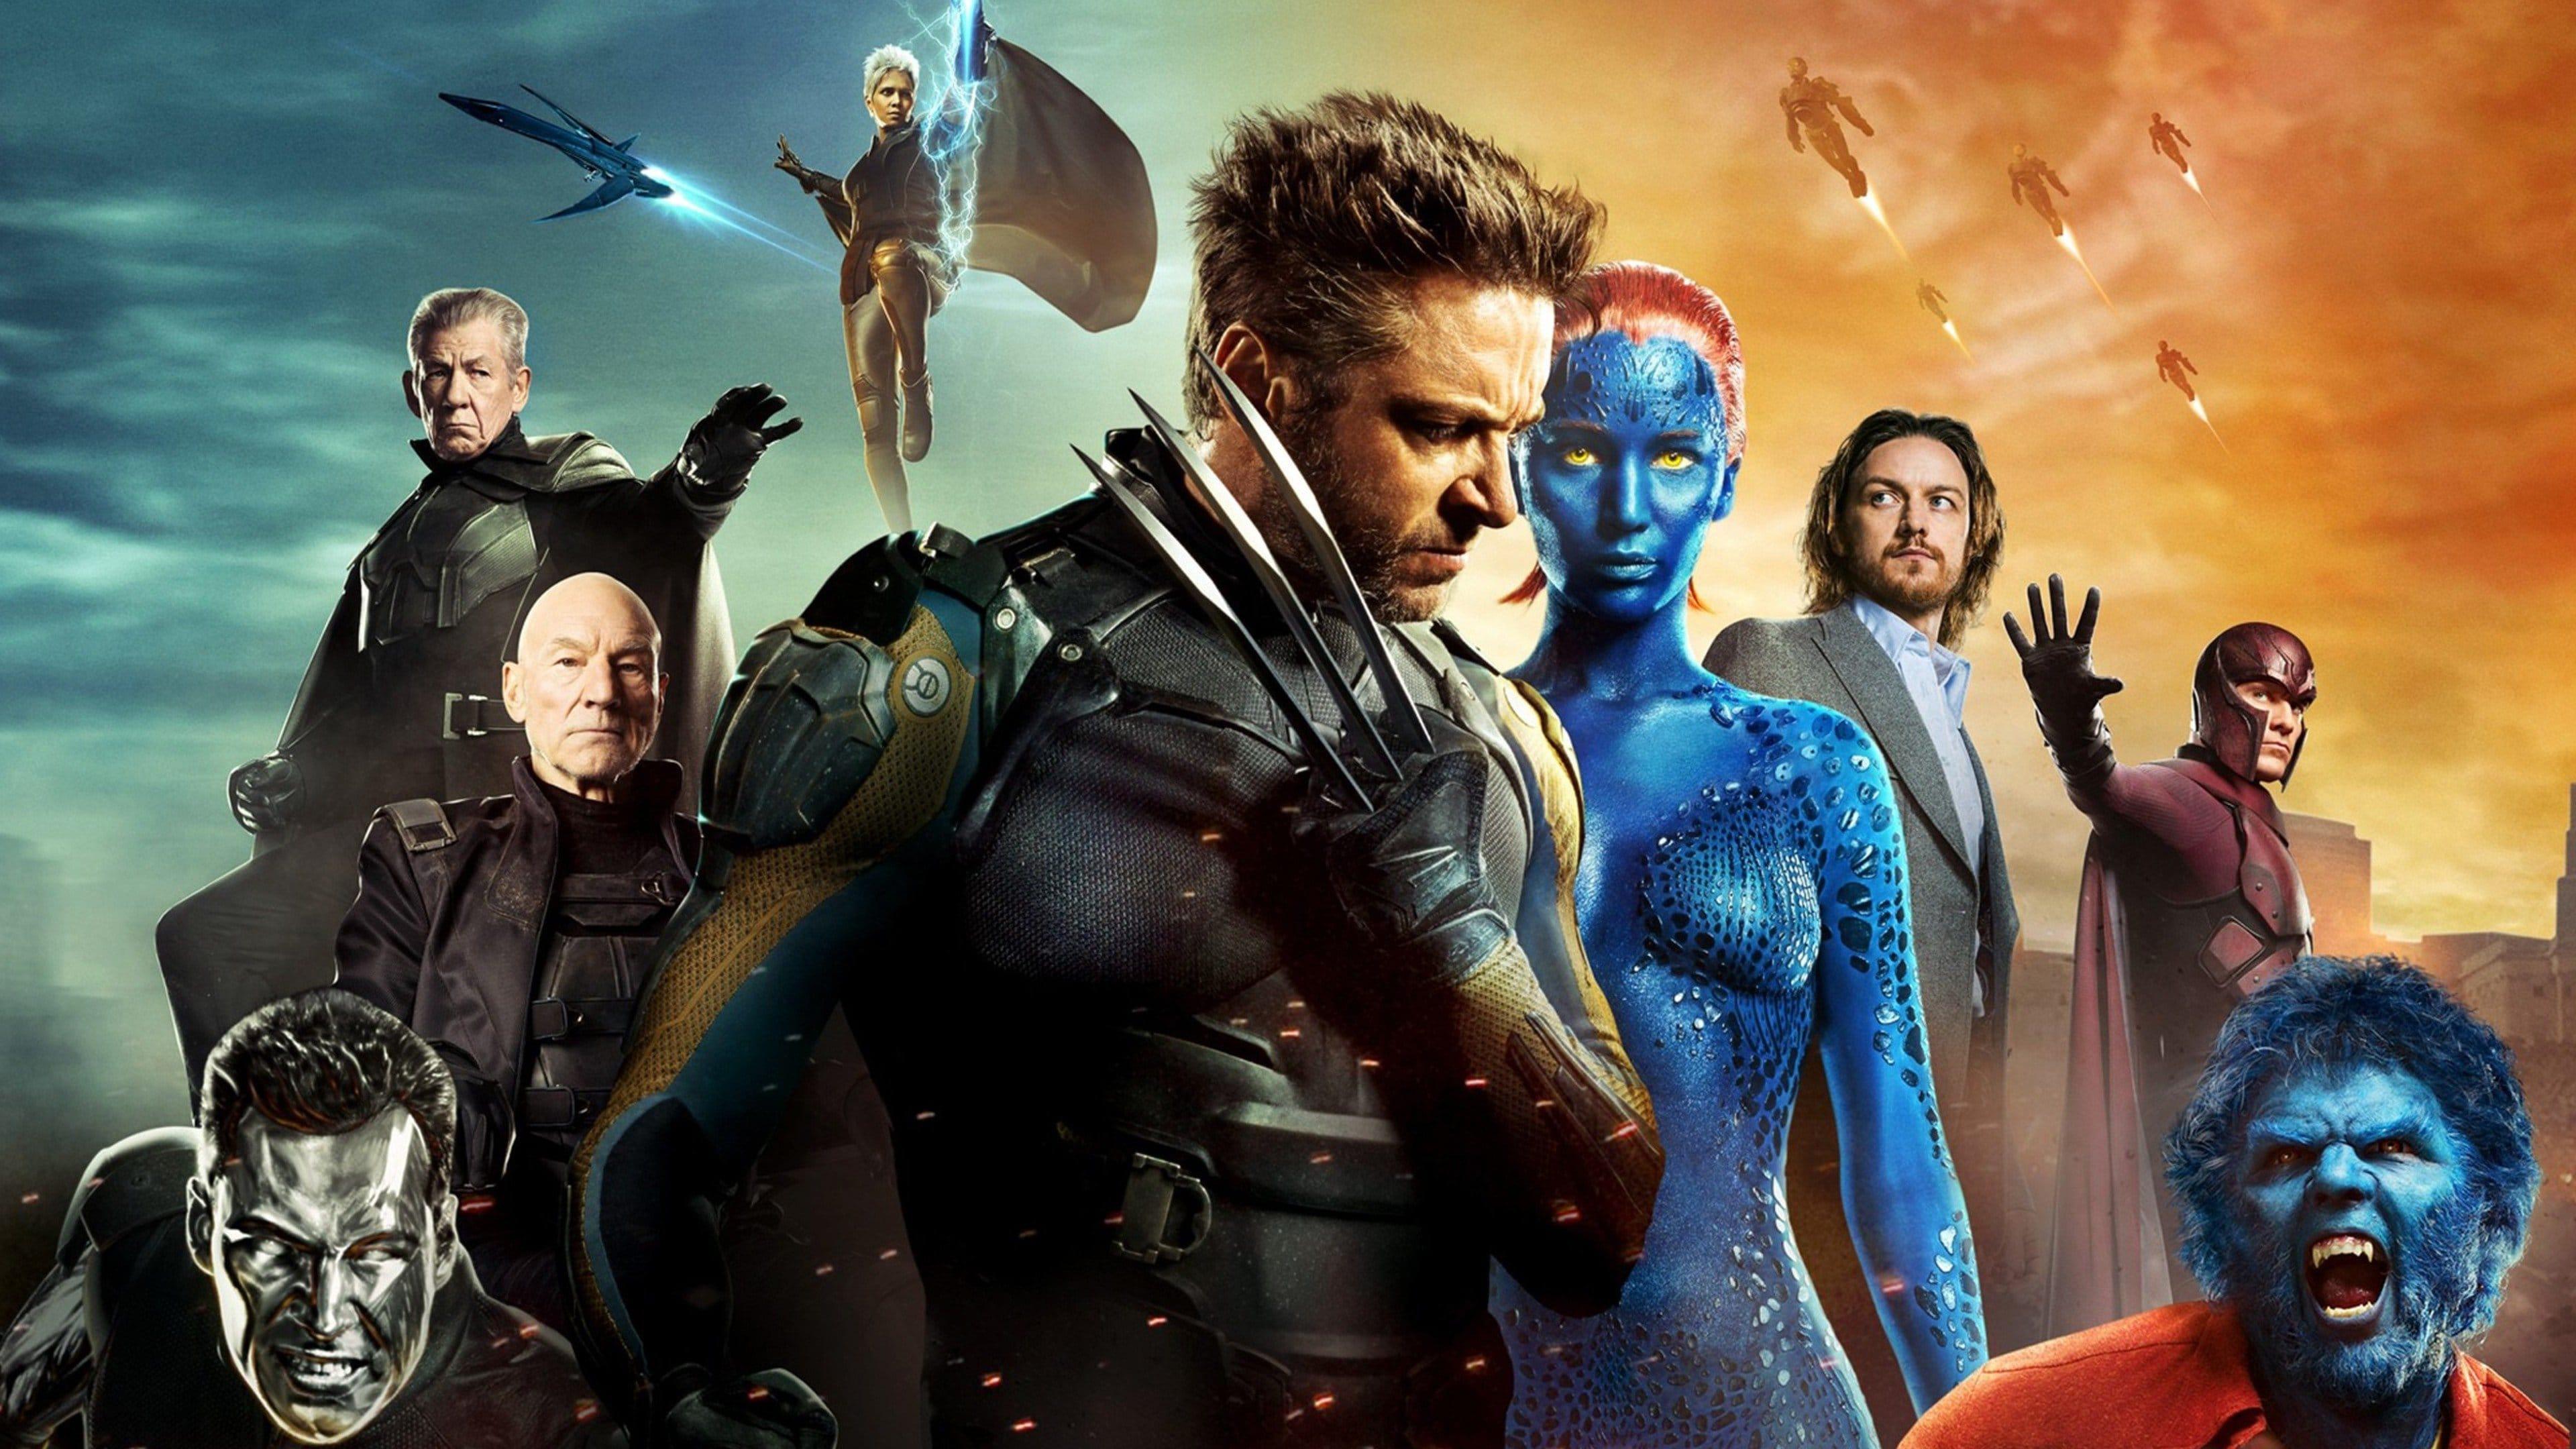 X Men Days Of Future Past HD Desktop Wallpapers 3840x2160